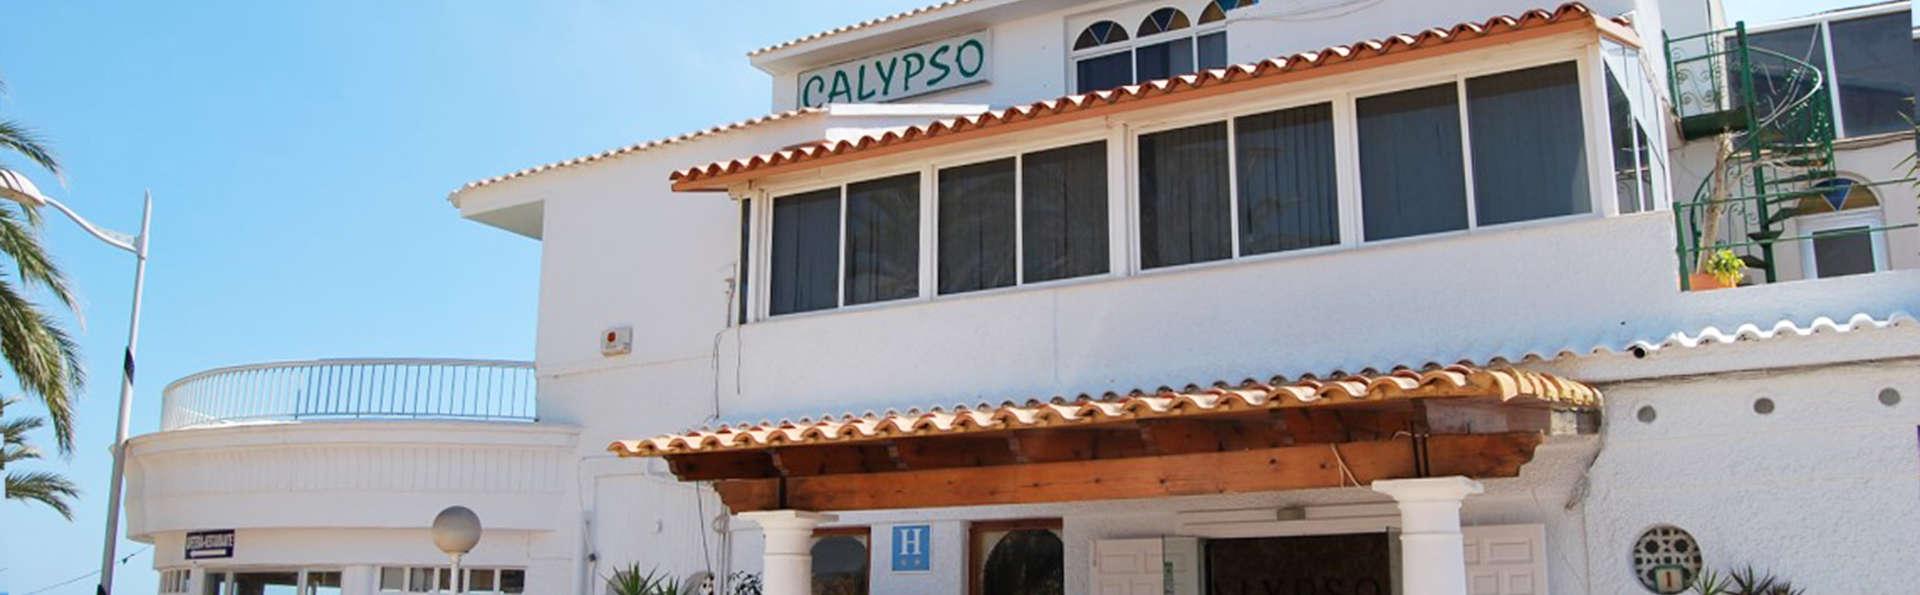 Hotel Calypso - EDIT_front.jpg